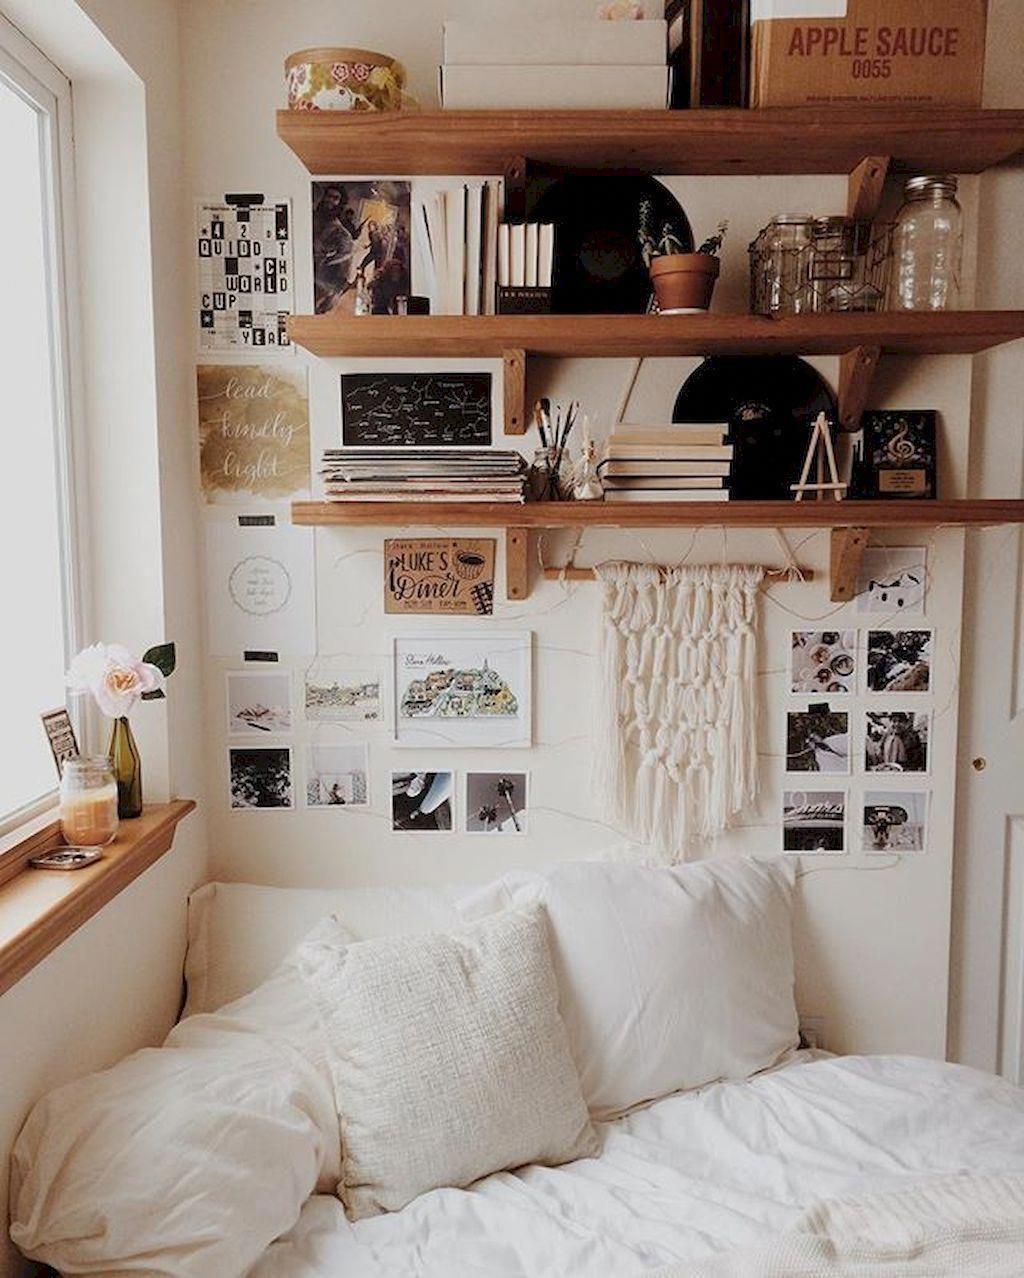 Home Design Ideas Budget: Small Bedroom Ideas On A Budget , Diy